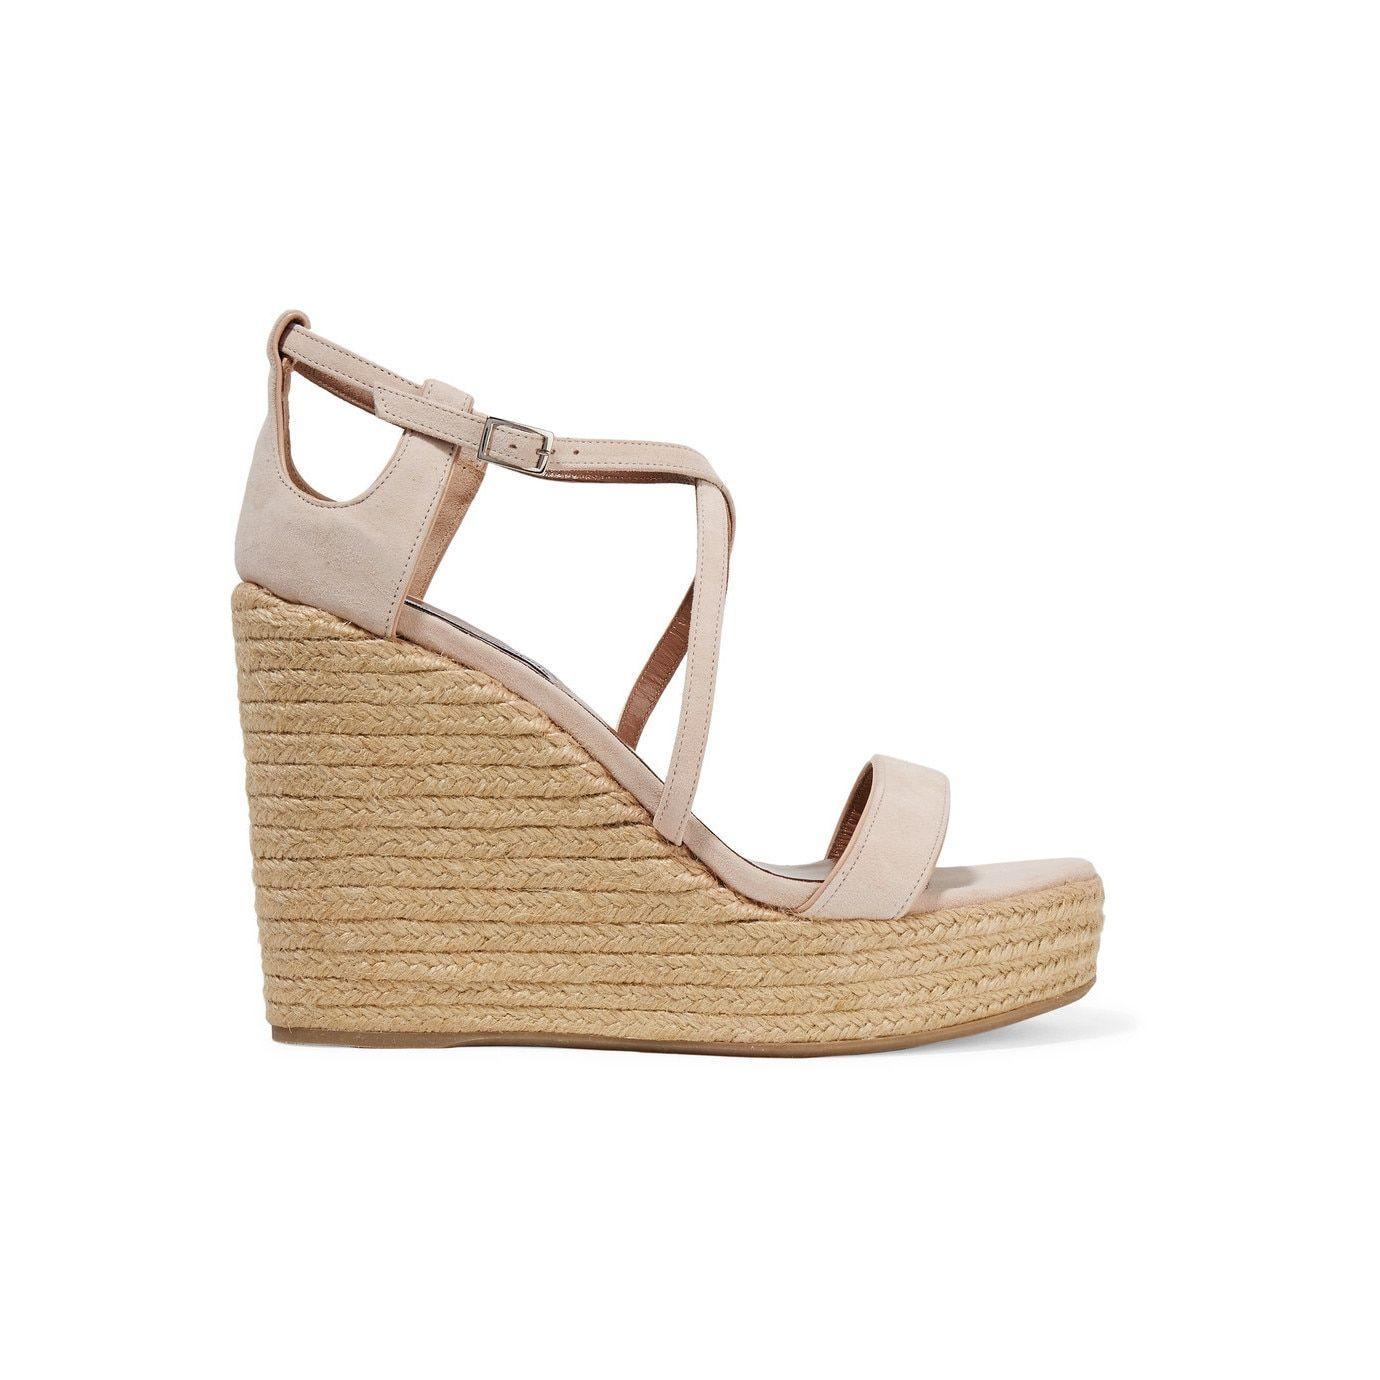 a19a0de2aab7 Tabitha Simmons Jenny Flesh Wedges Platform Wedges Shoes, Wedge Shoes,  Wedge Sandals, Tabitha